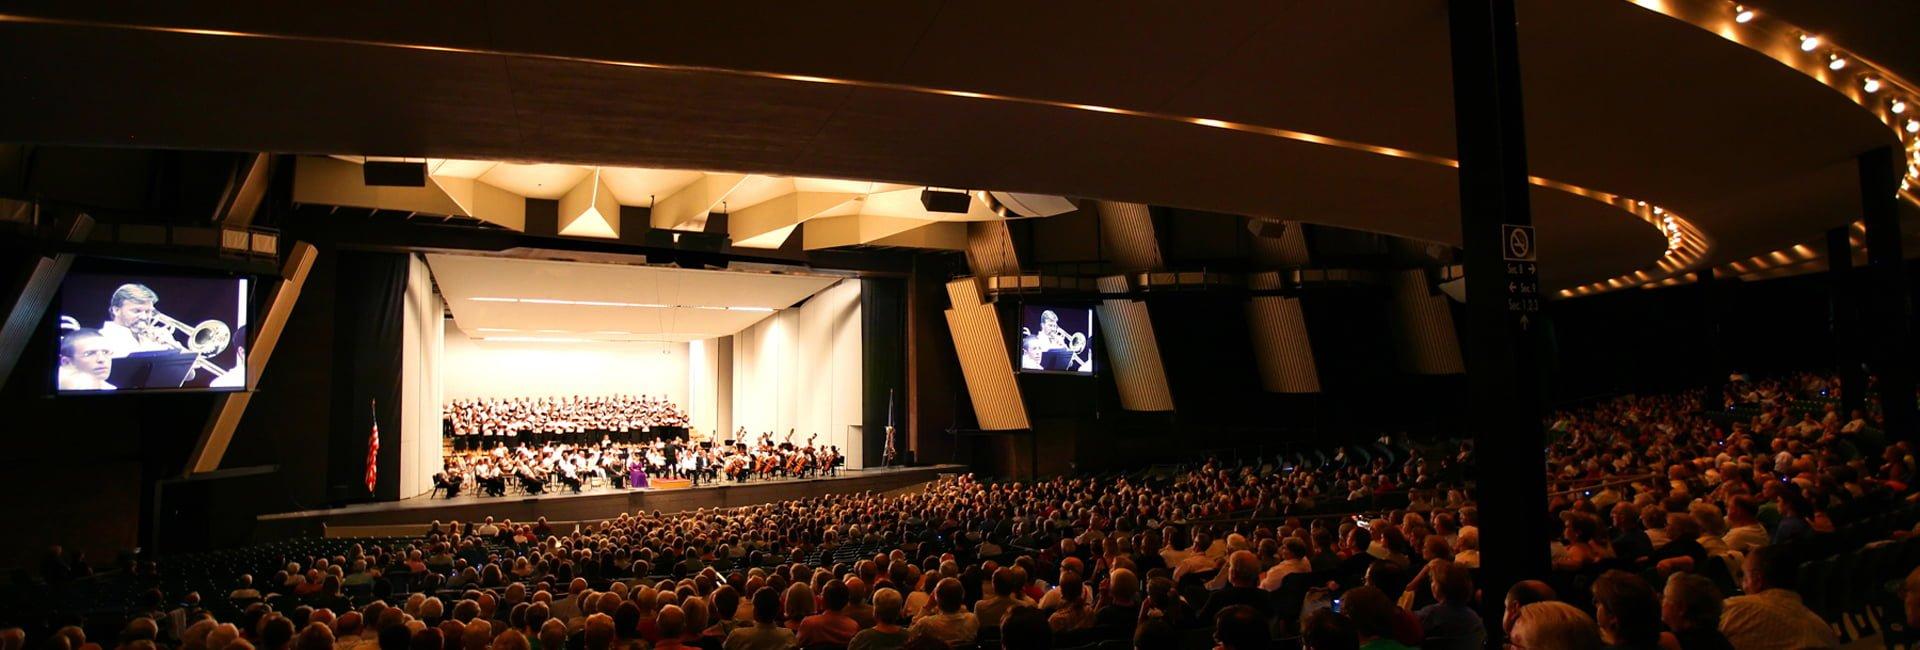 Photo Courtesy of Saratoga Performing Arts Center, Philadelphia Orchestra performance | Capital-Saratoga Region